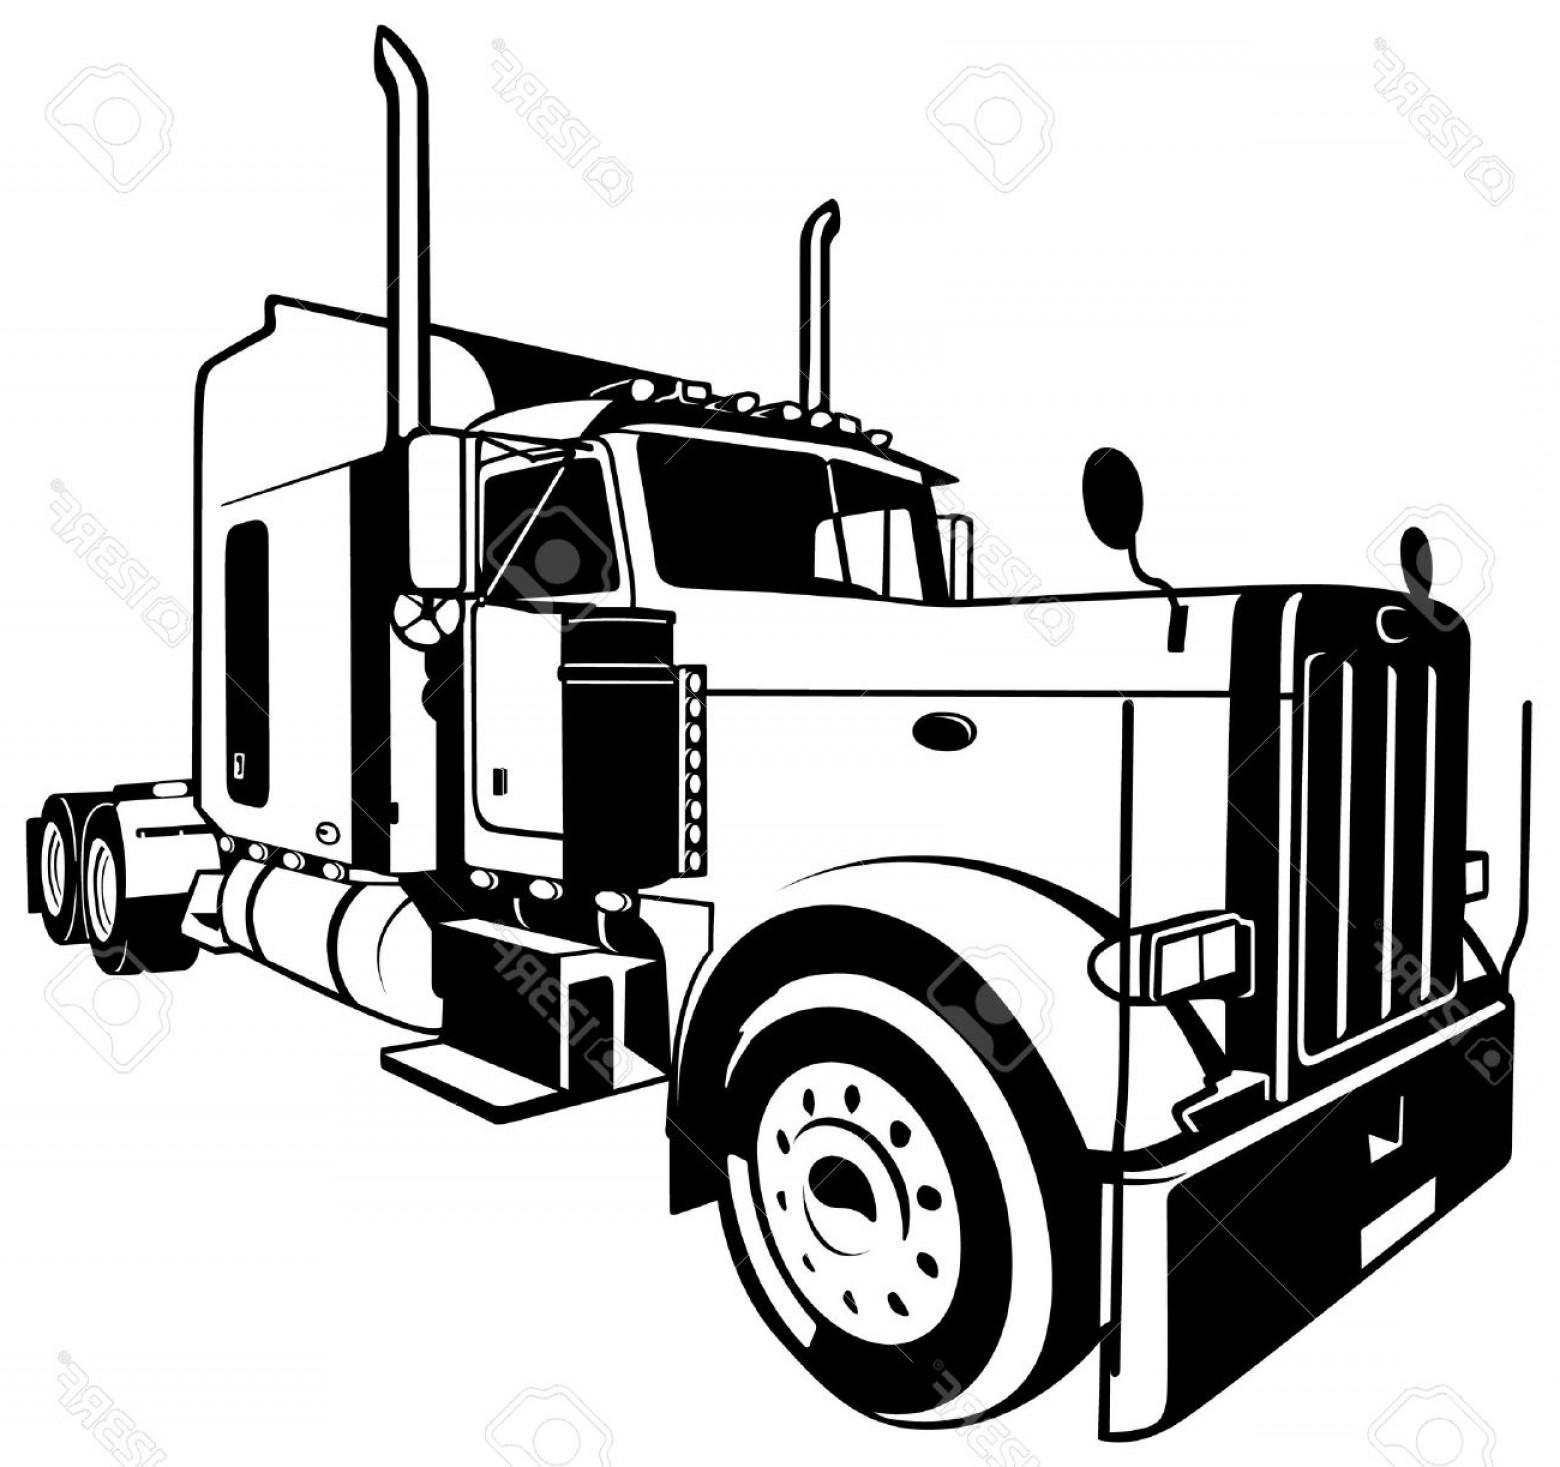 Semi Truck Vector At Getdrawings